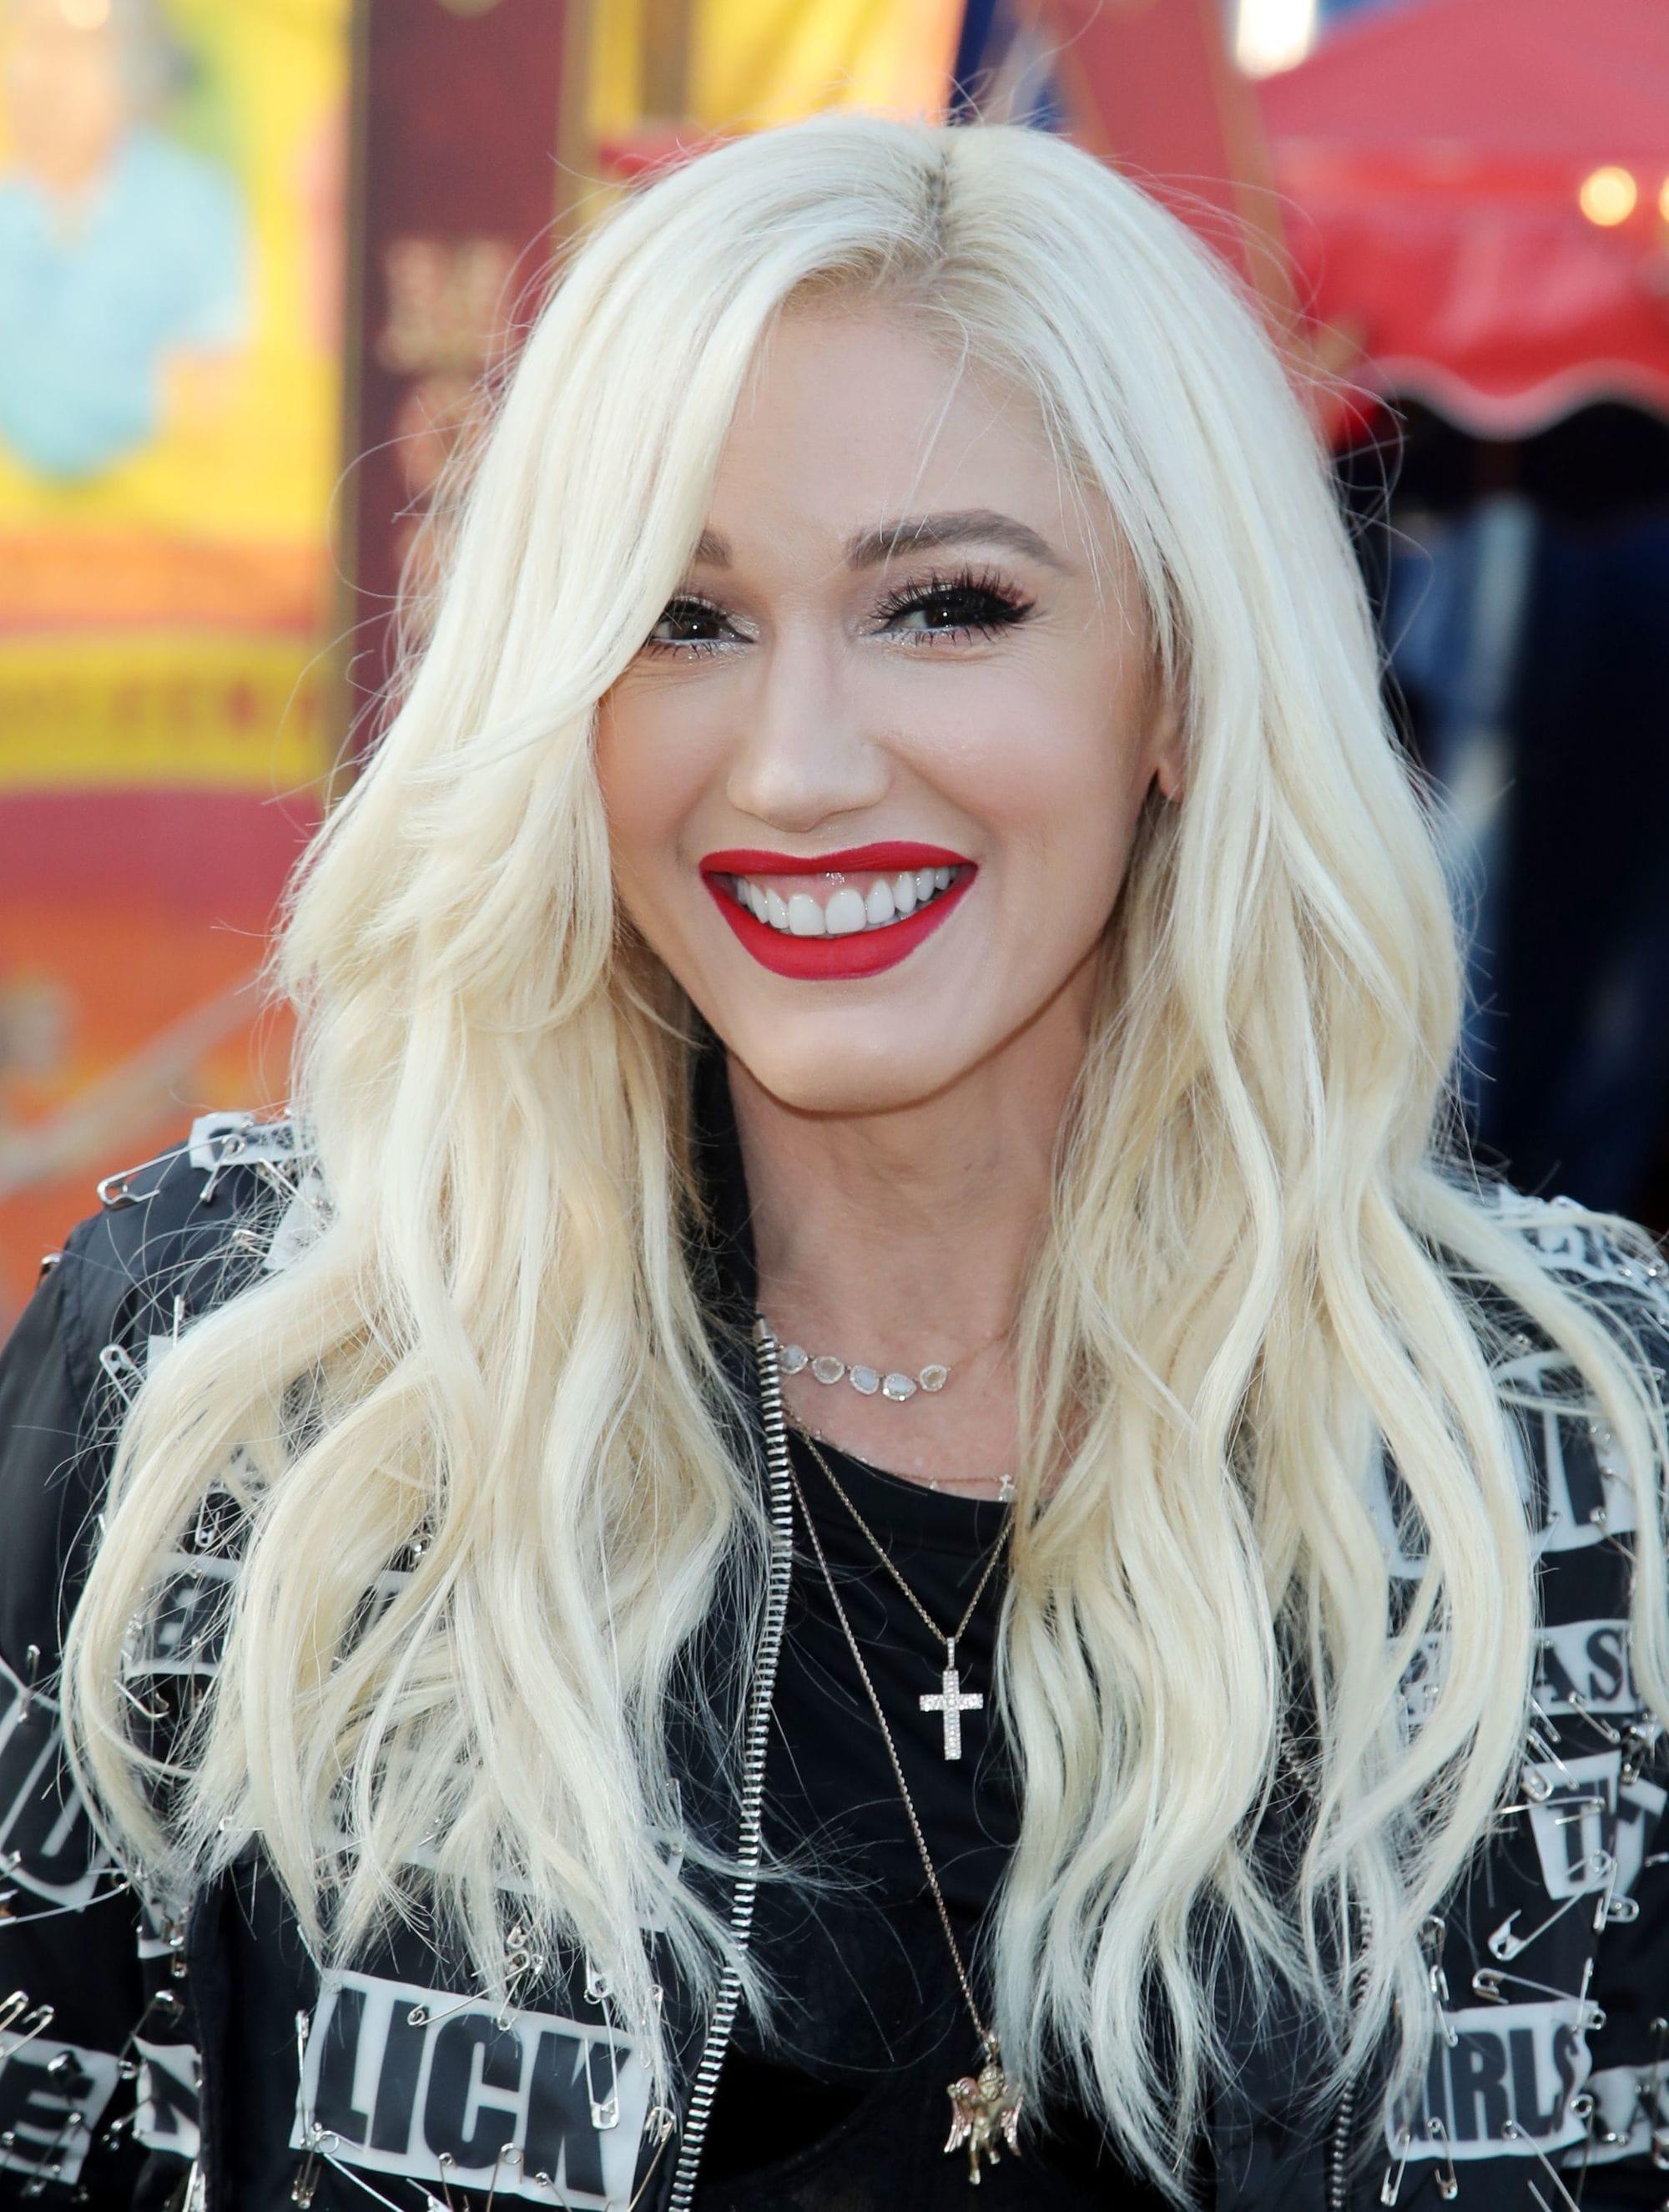 long-blonde-bleached-wavy-hair-texture Кому идет светло-русый цвет волос фото